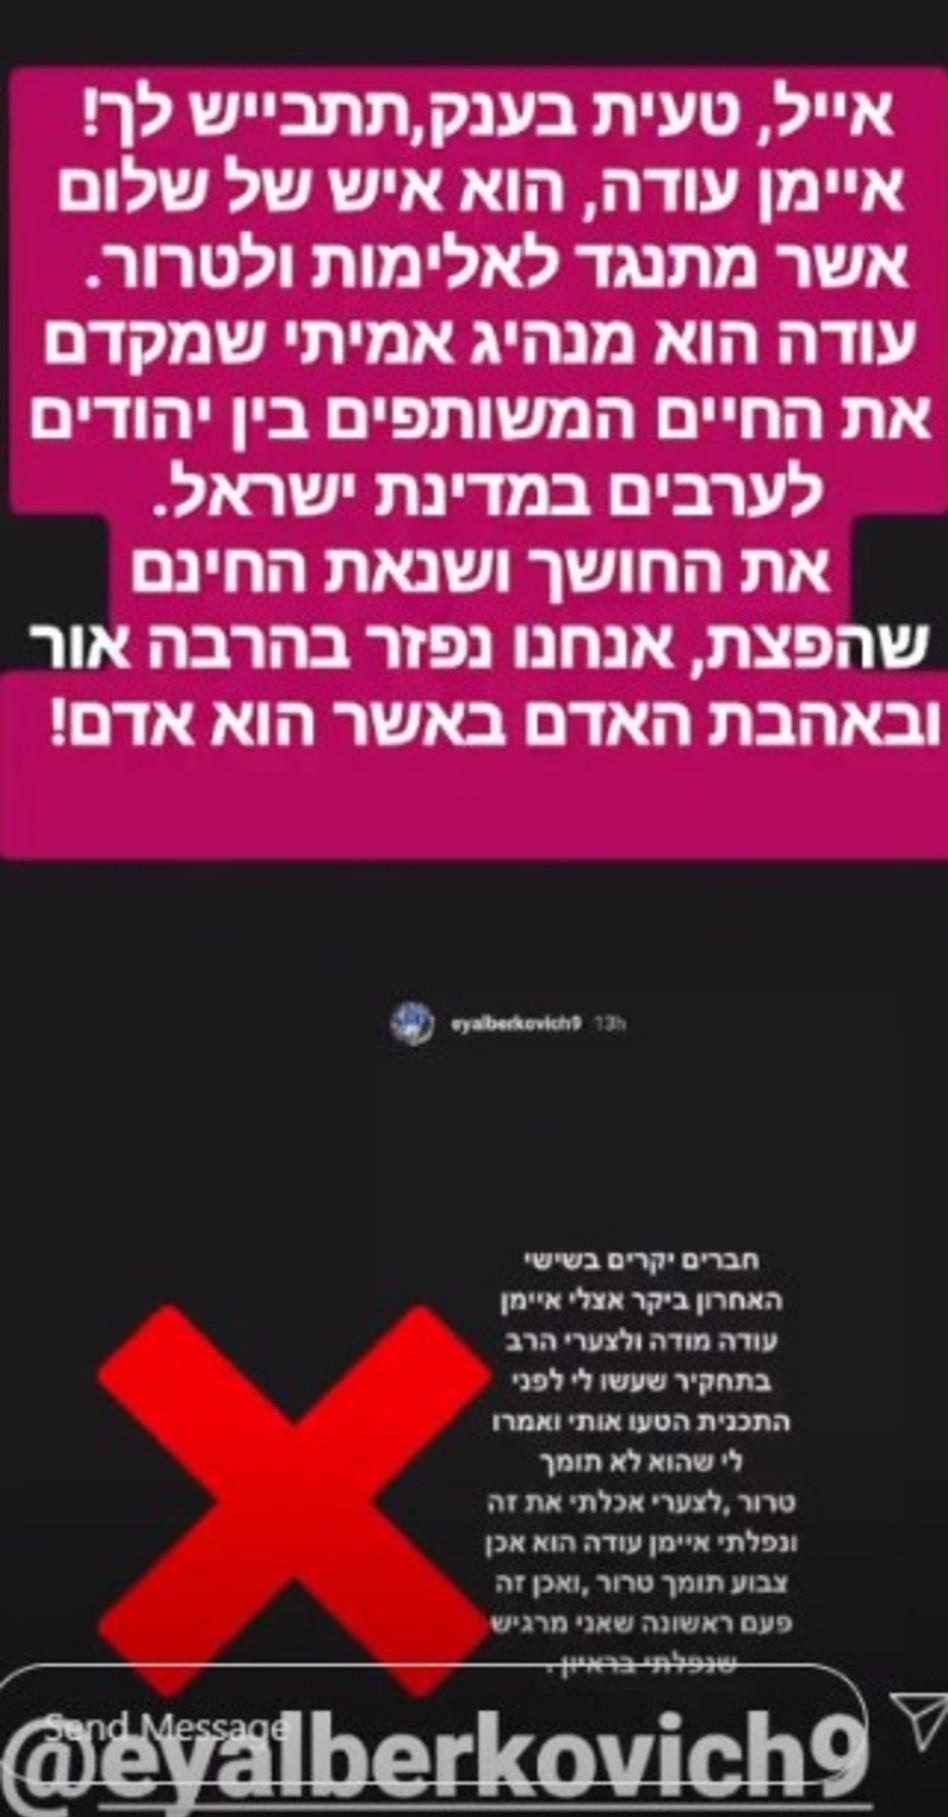 ניר אבישי כהן יוצא נגד אייל ברקוביץ' (צילום: צילום מסך אינסטגרם)